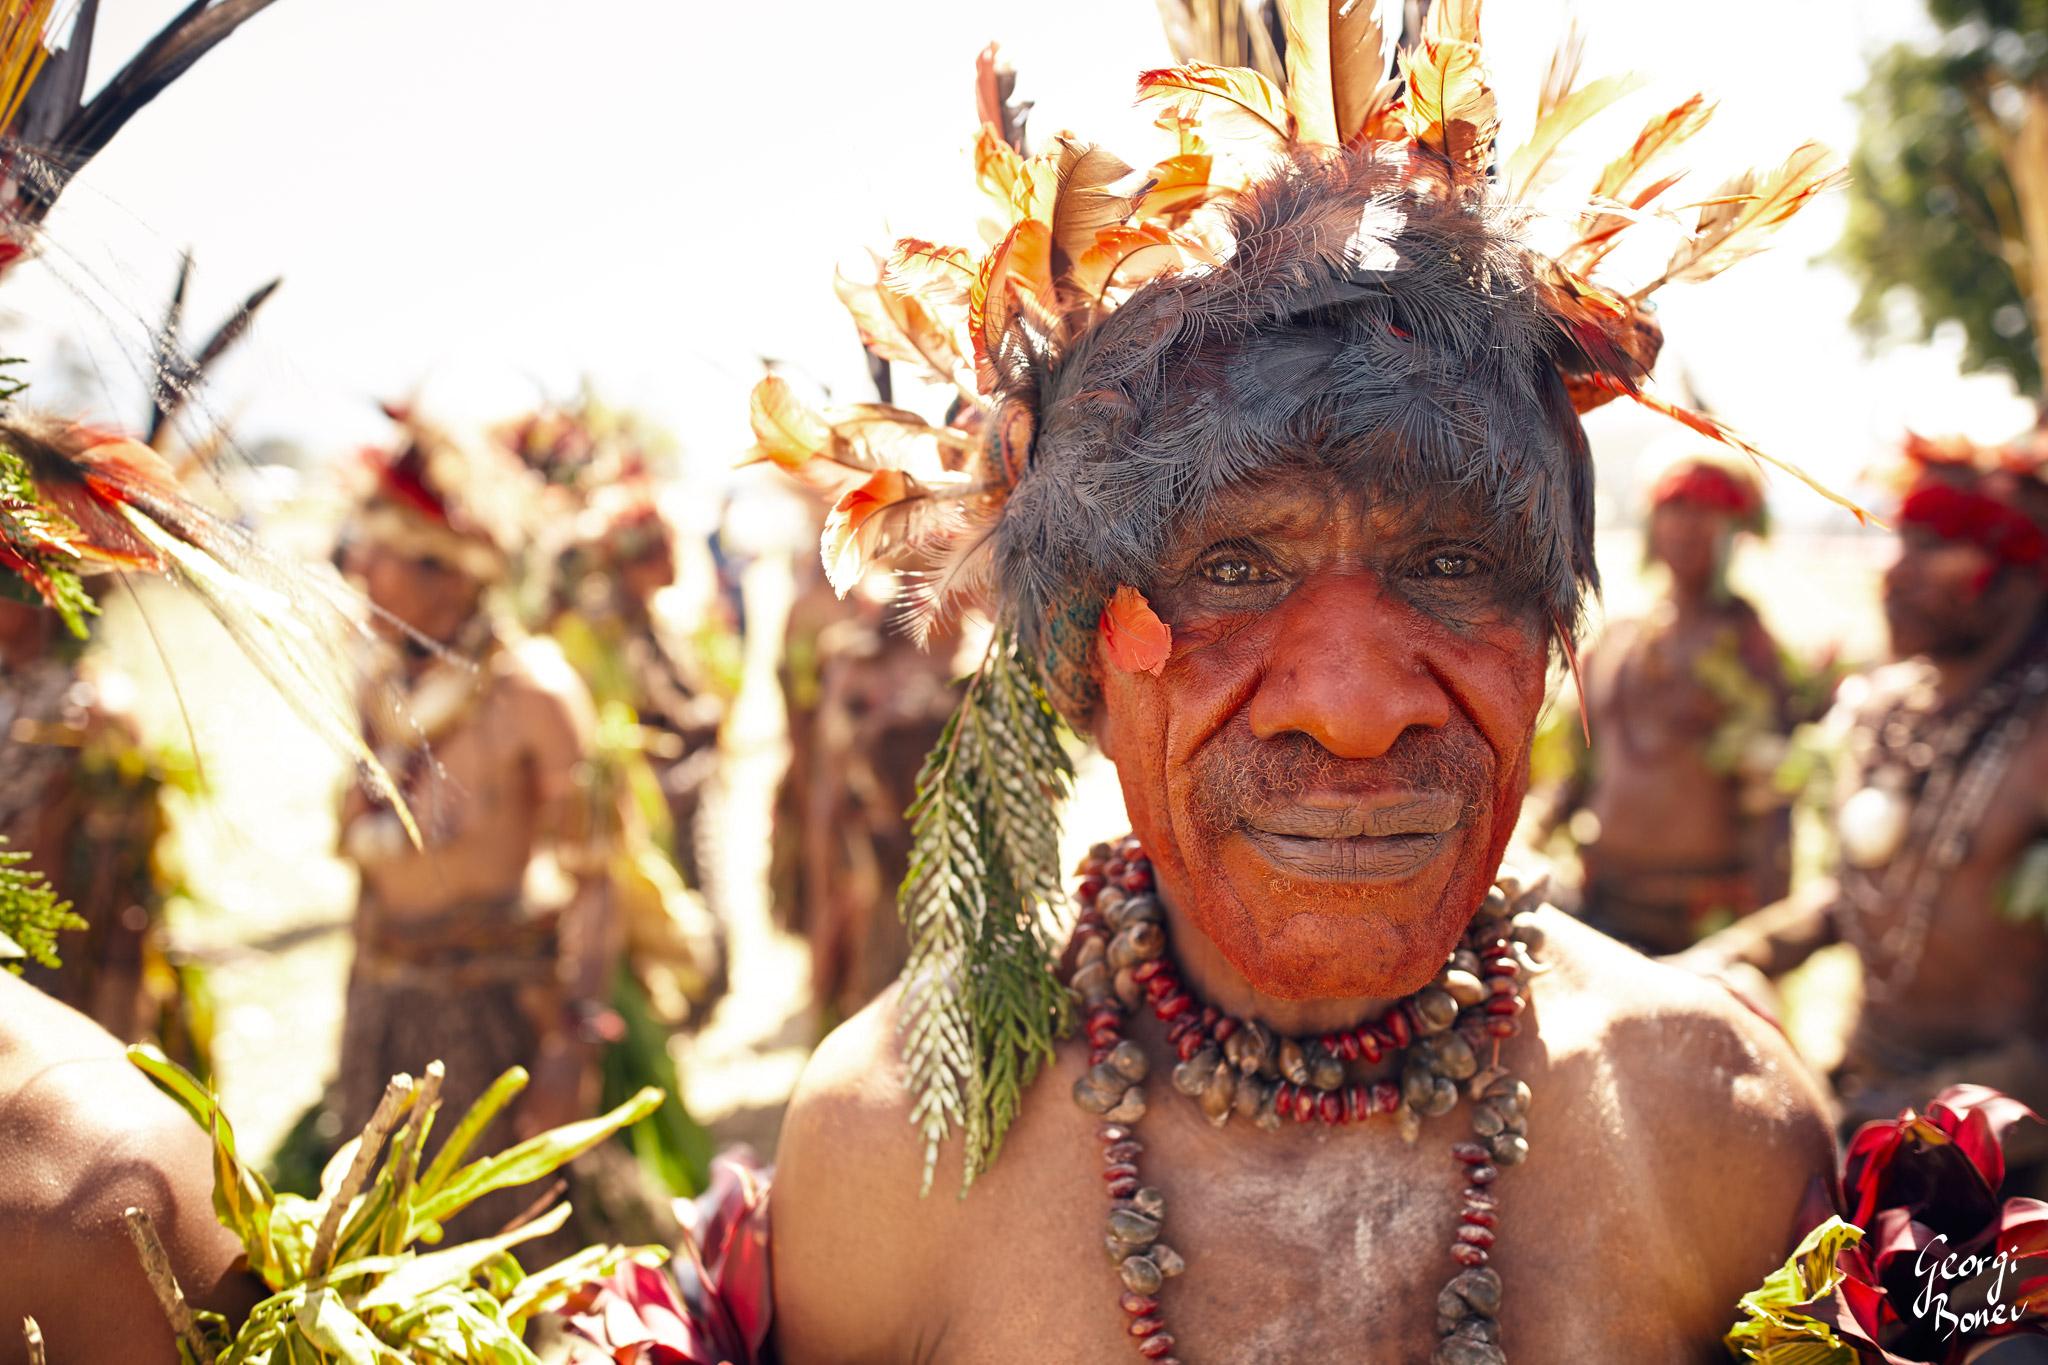 YEPIMAGO IS ATRIGU WARRIOR IN PAPUA NEW GUINEA'S HIGH LAND